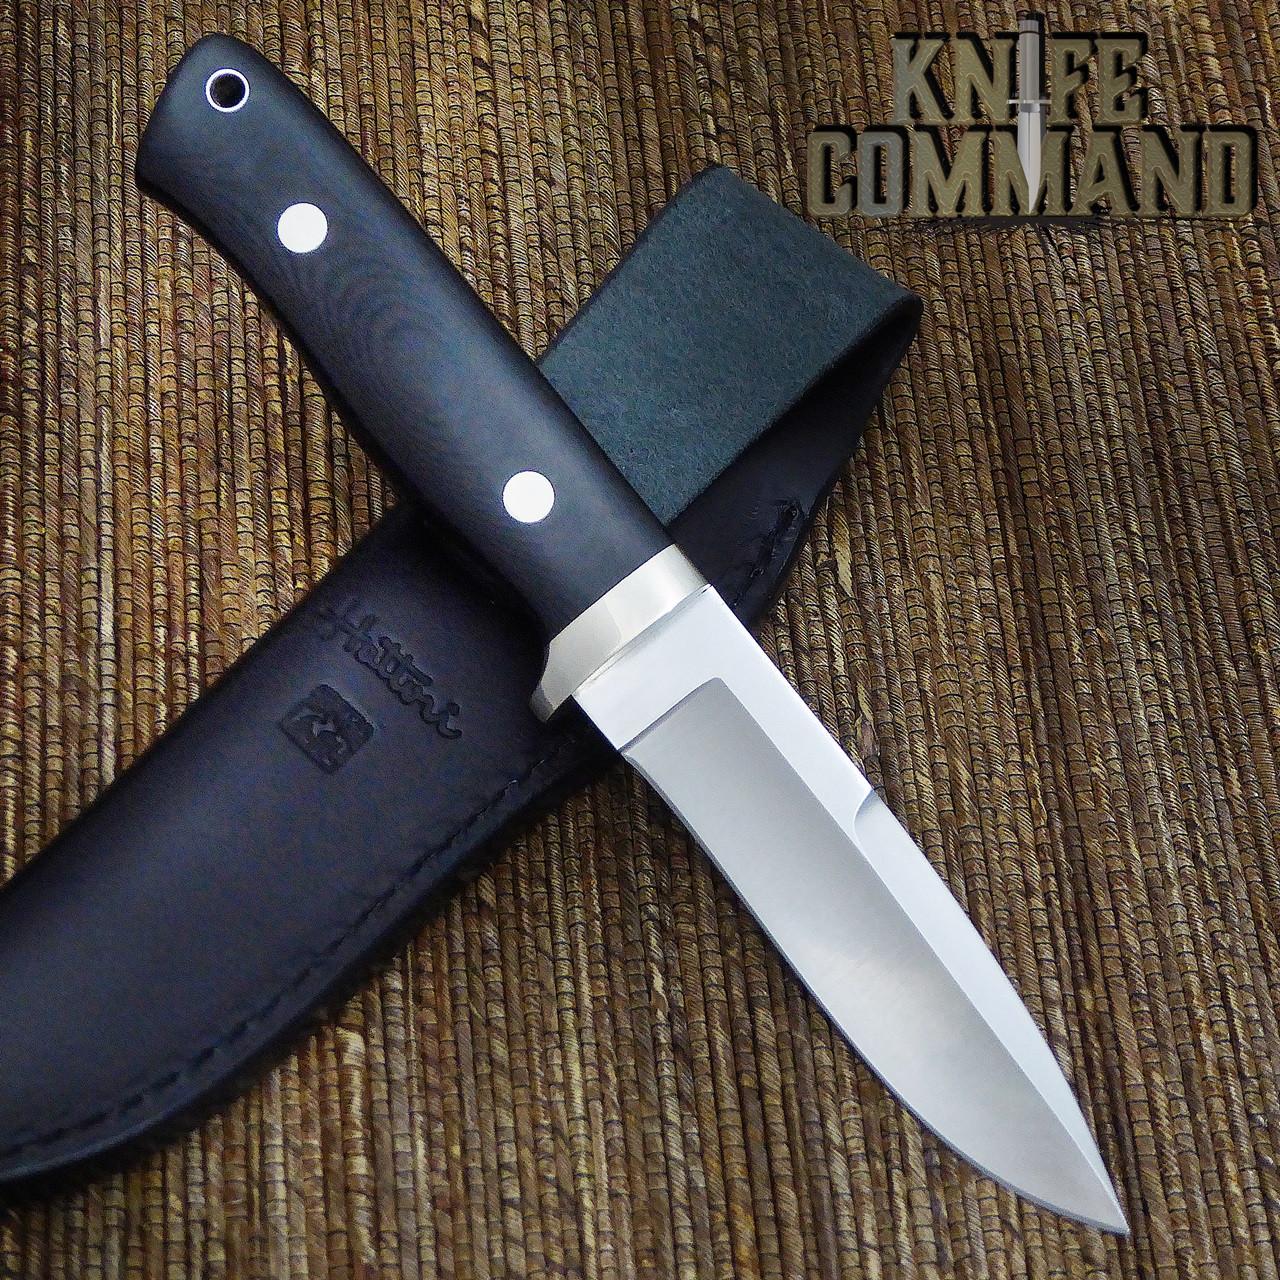 Hattori Knives Dream Hunter Ht-05 White Spacer Hunting Knife.  Nickel Silver hardware.